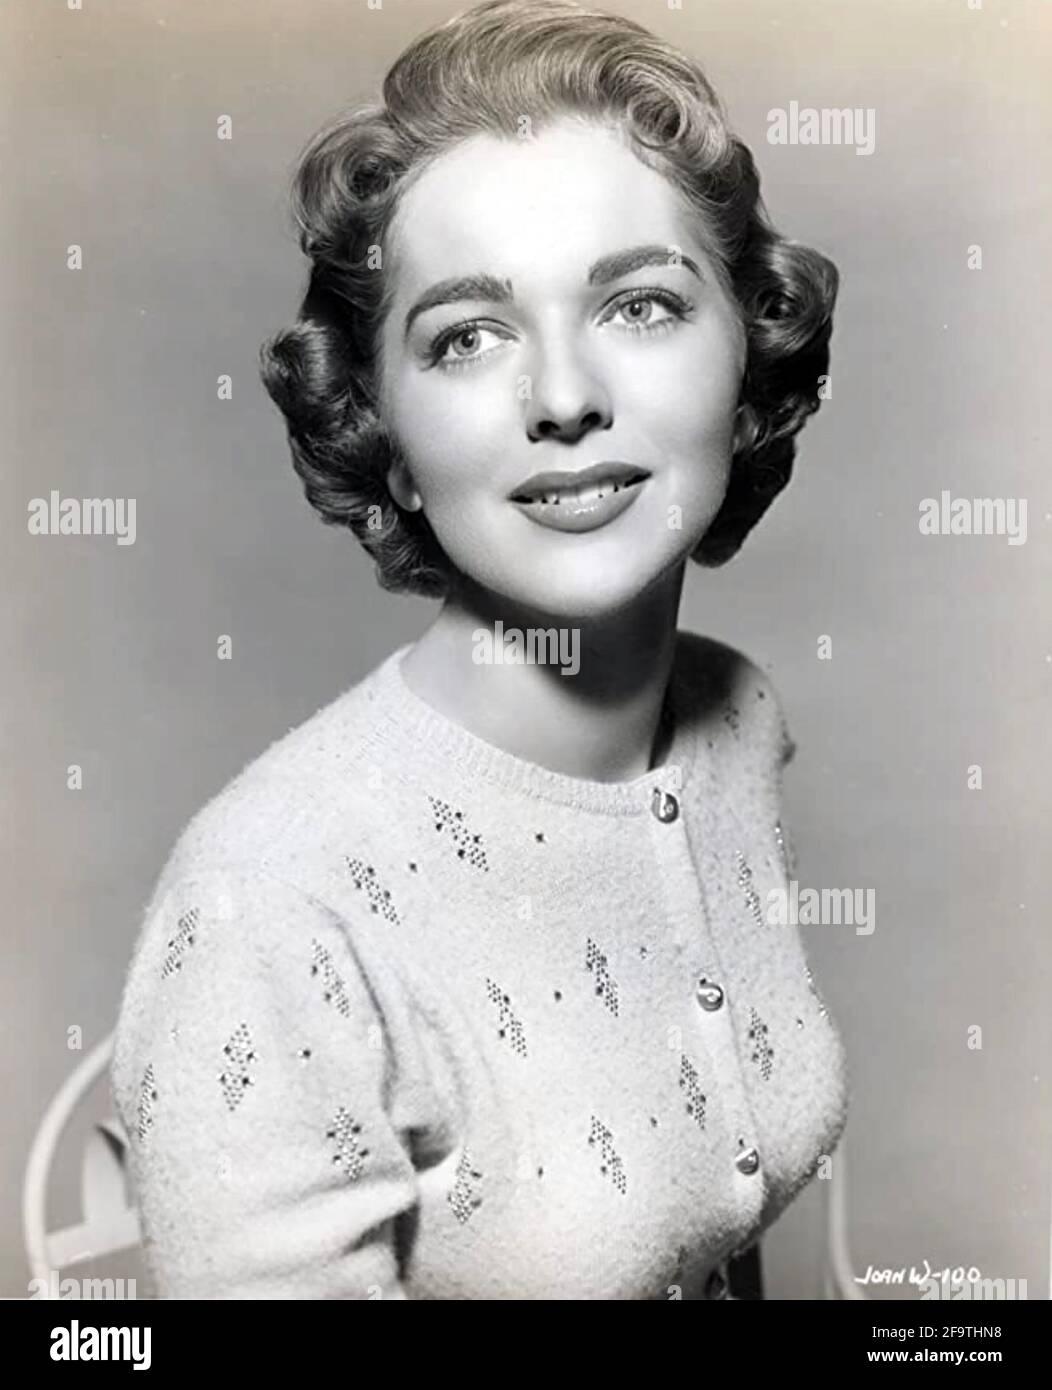 JOAN WELDON (1930-2021) attrice cinematografica americana nel 1954 Foto Stock